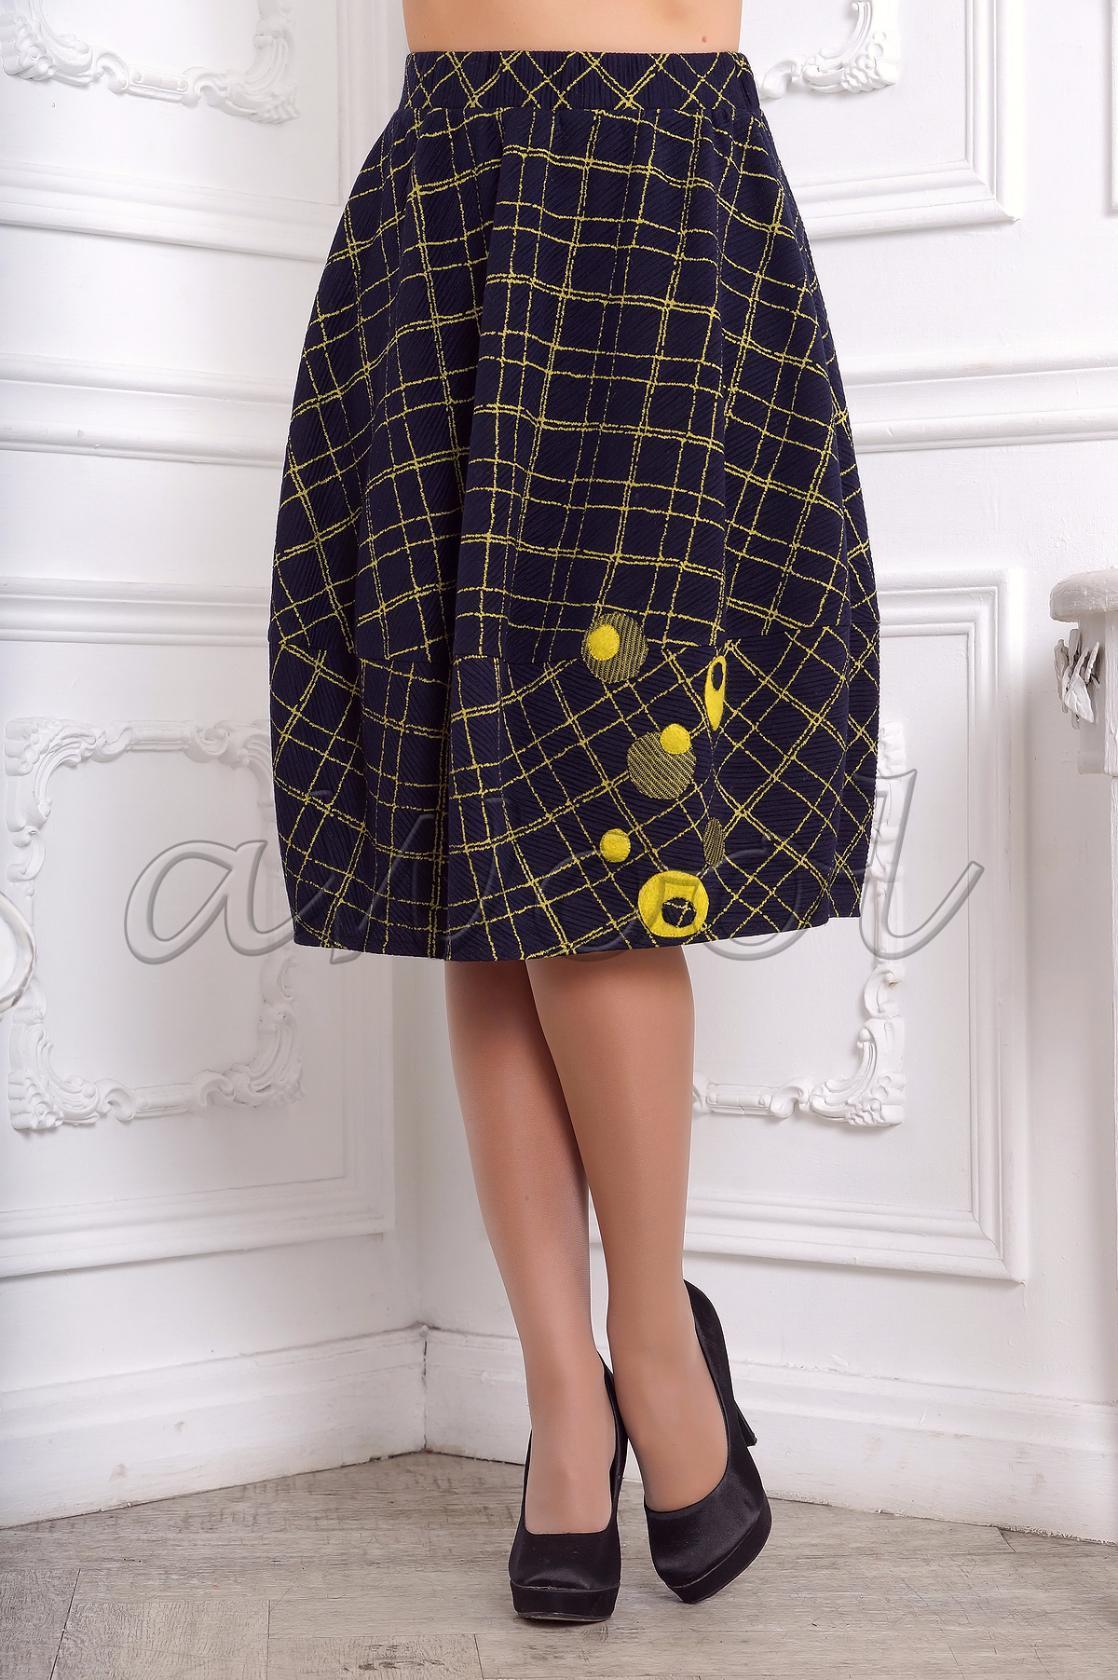 29abc5b6735 Цена юбки 6 600 рублей. Купить юбку можно по ссылке   http   www.livemaster.ru item 17413221-odezhda-yubka-..  awool